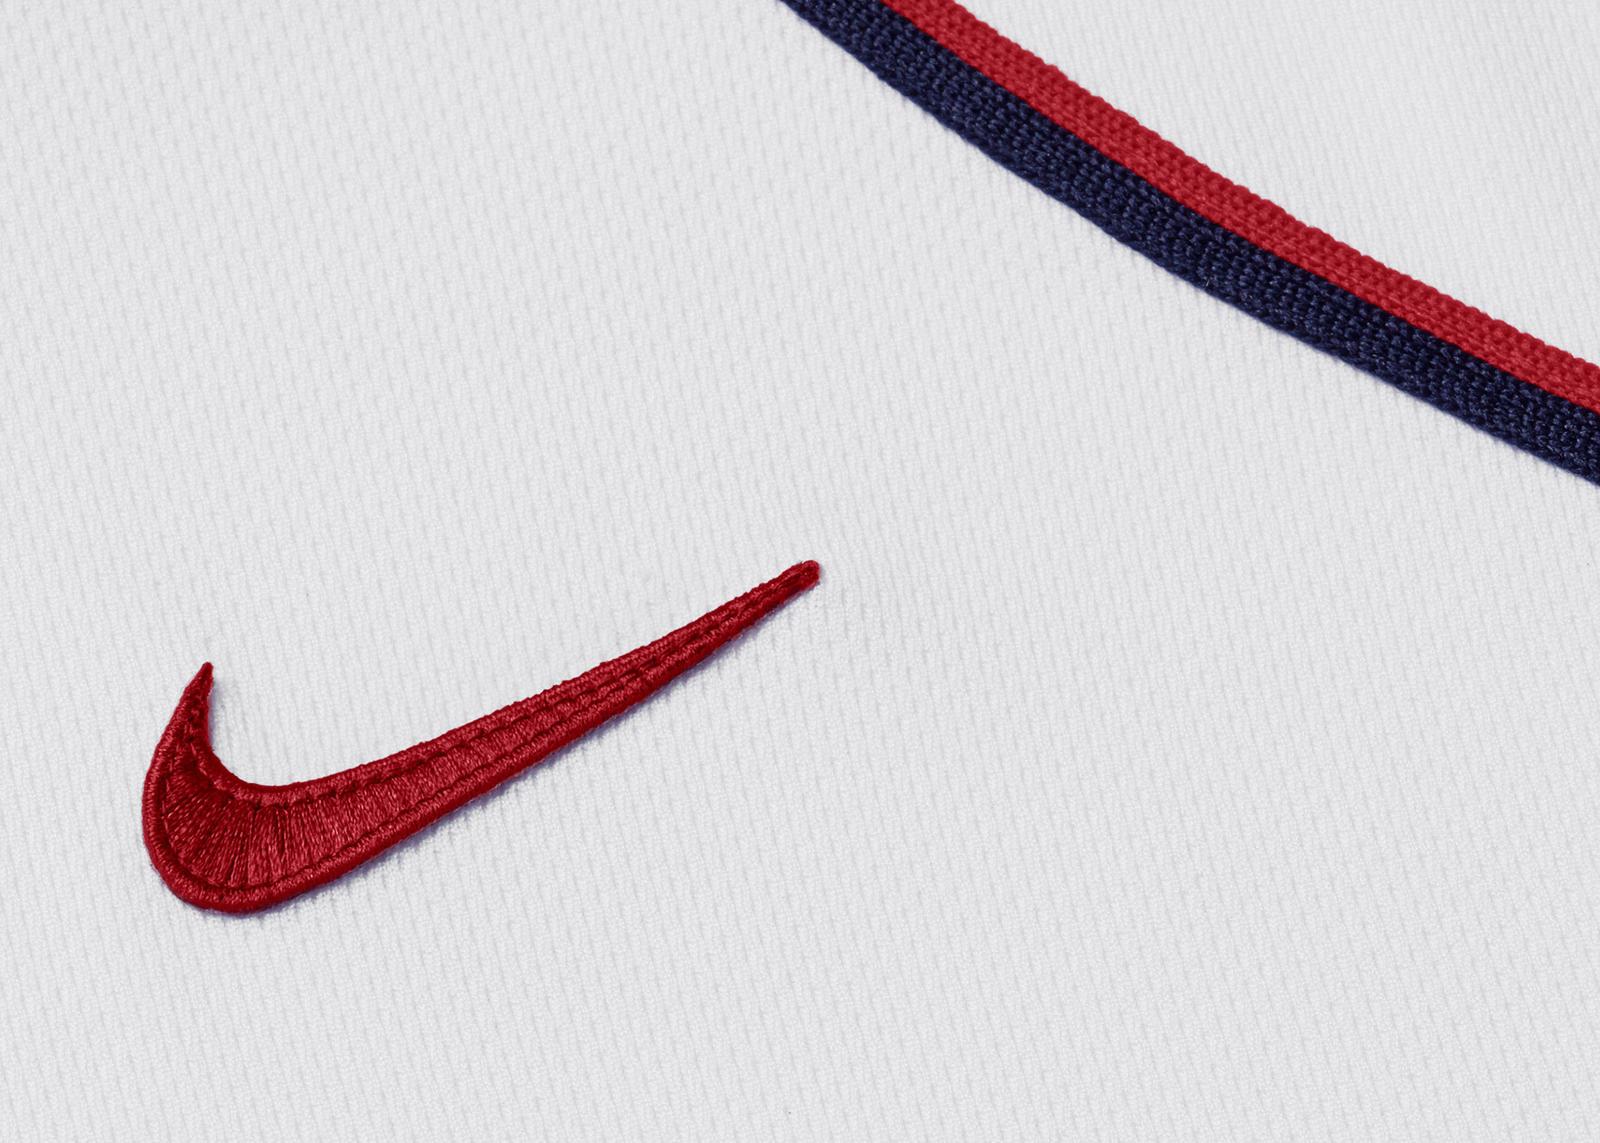 Nike x Major League Baseball Uniforms 2020 Official Images.